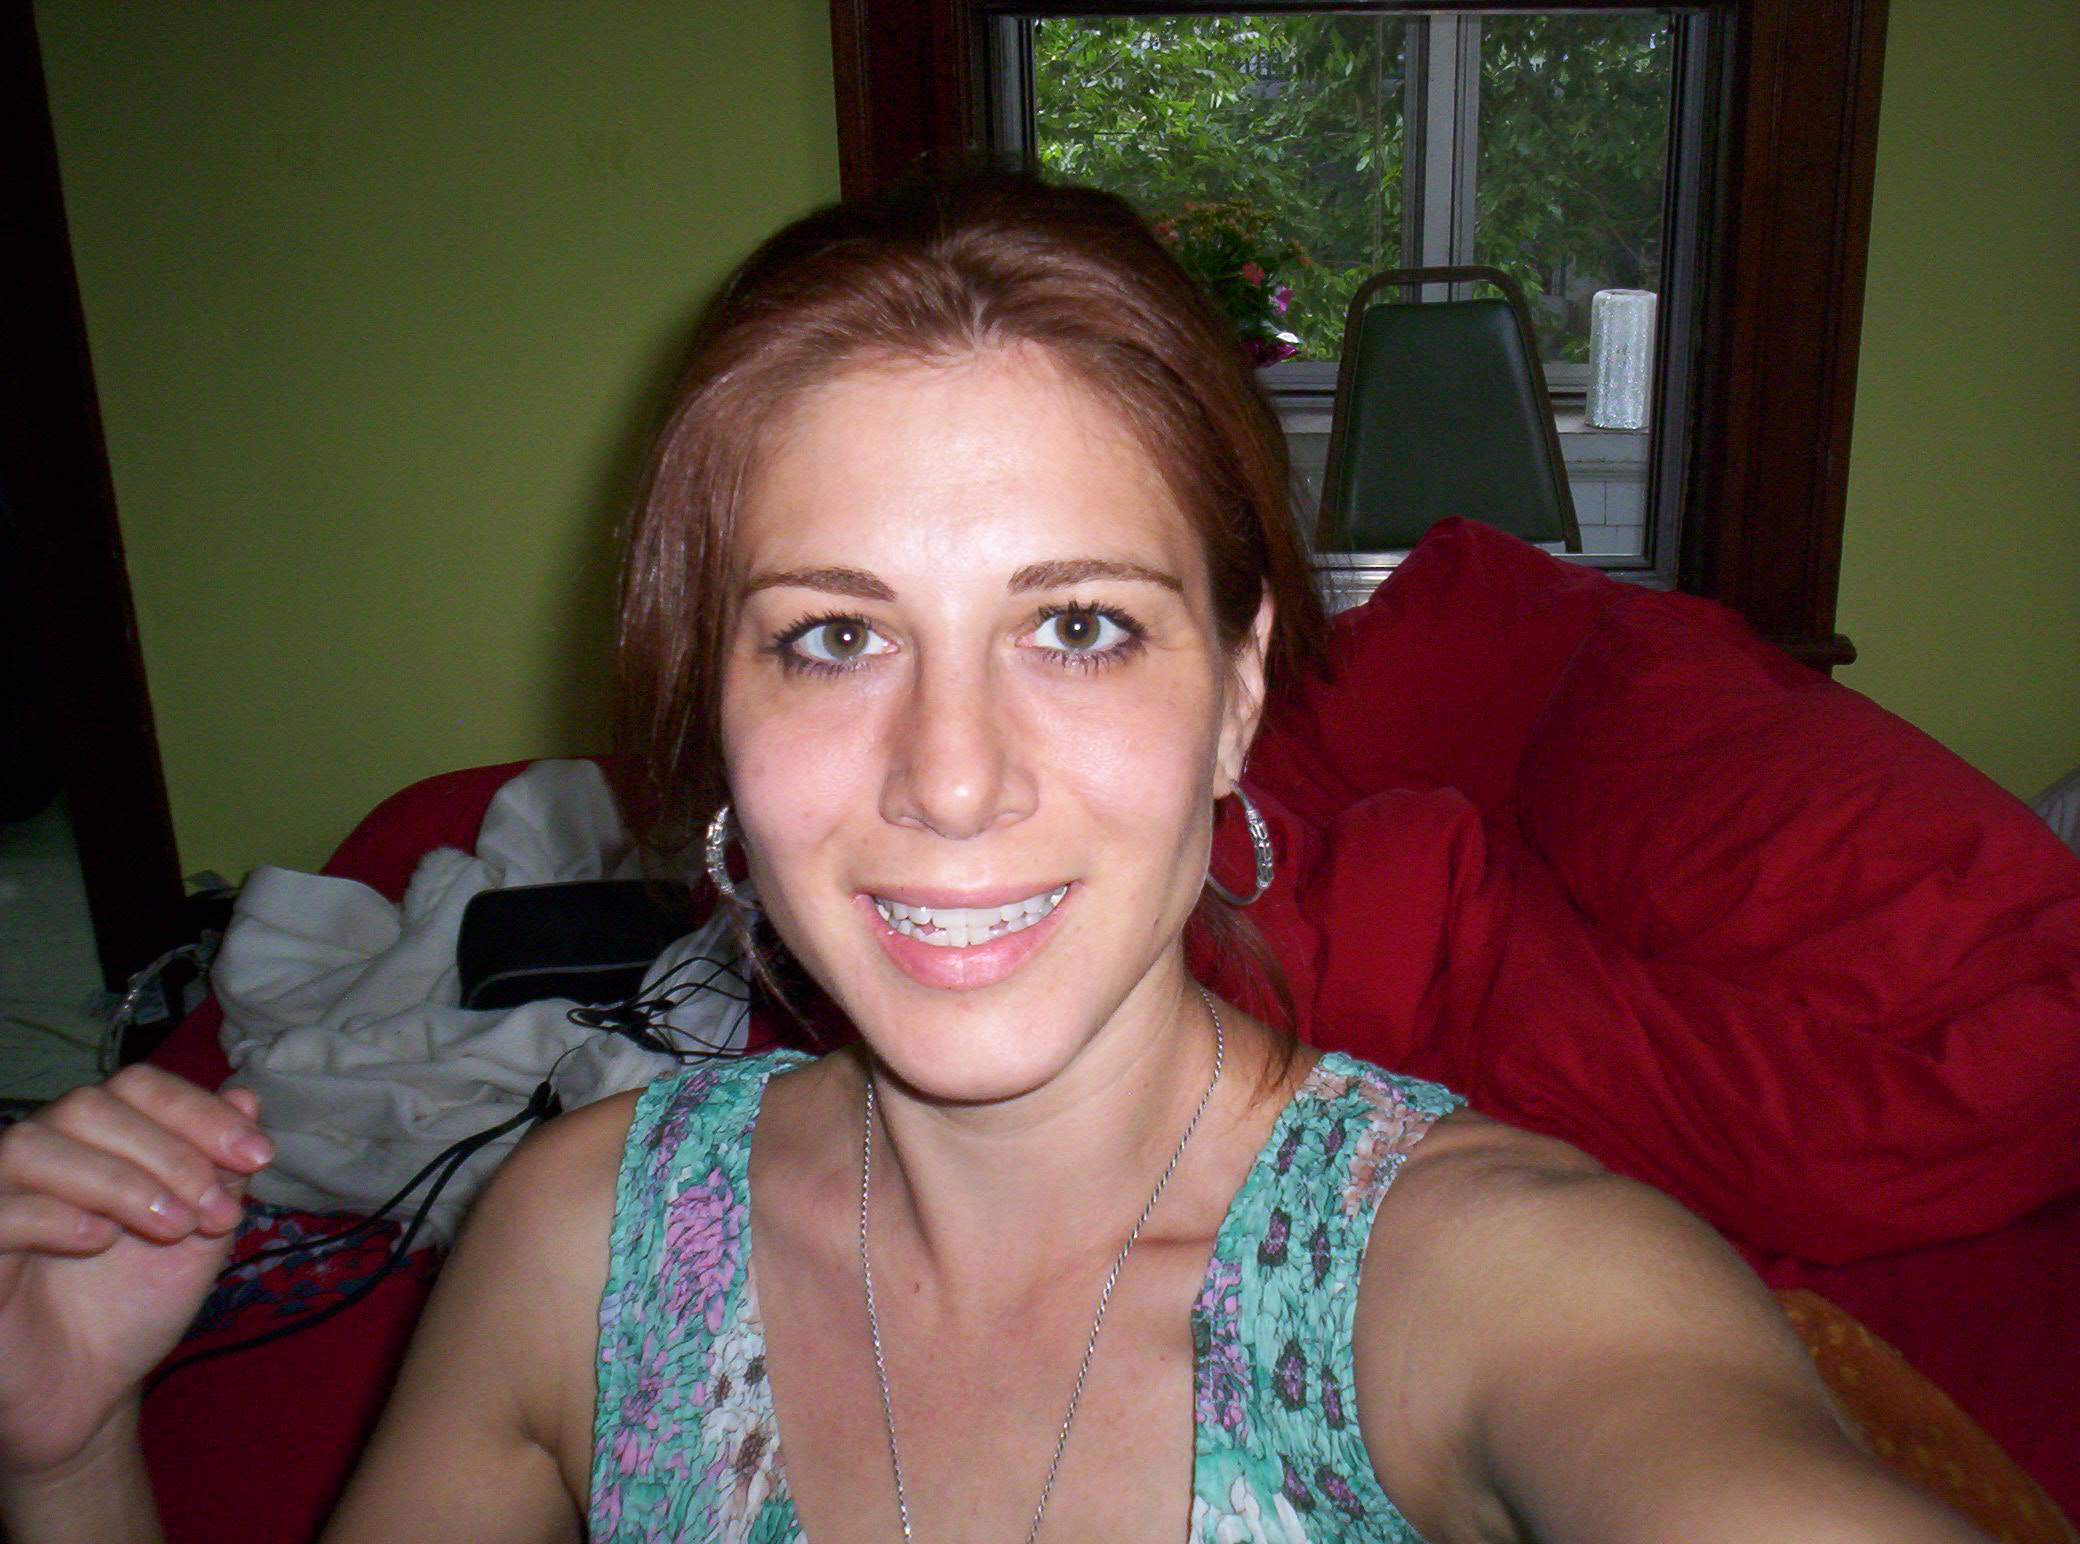 Kellyanne conway hot pics